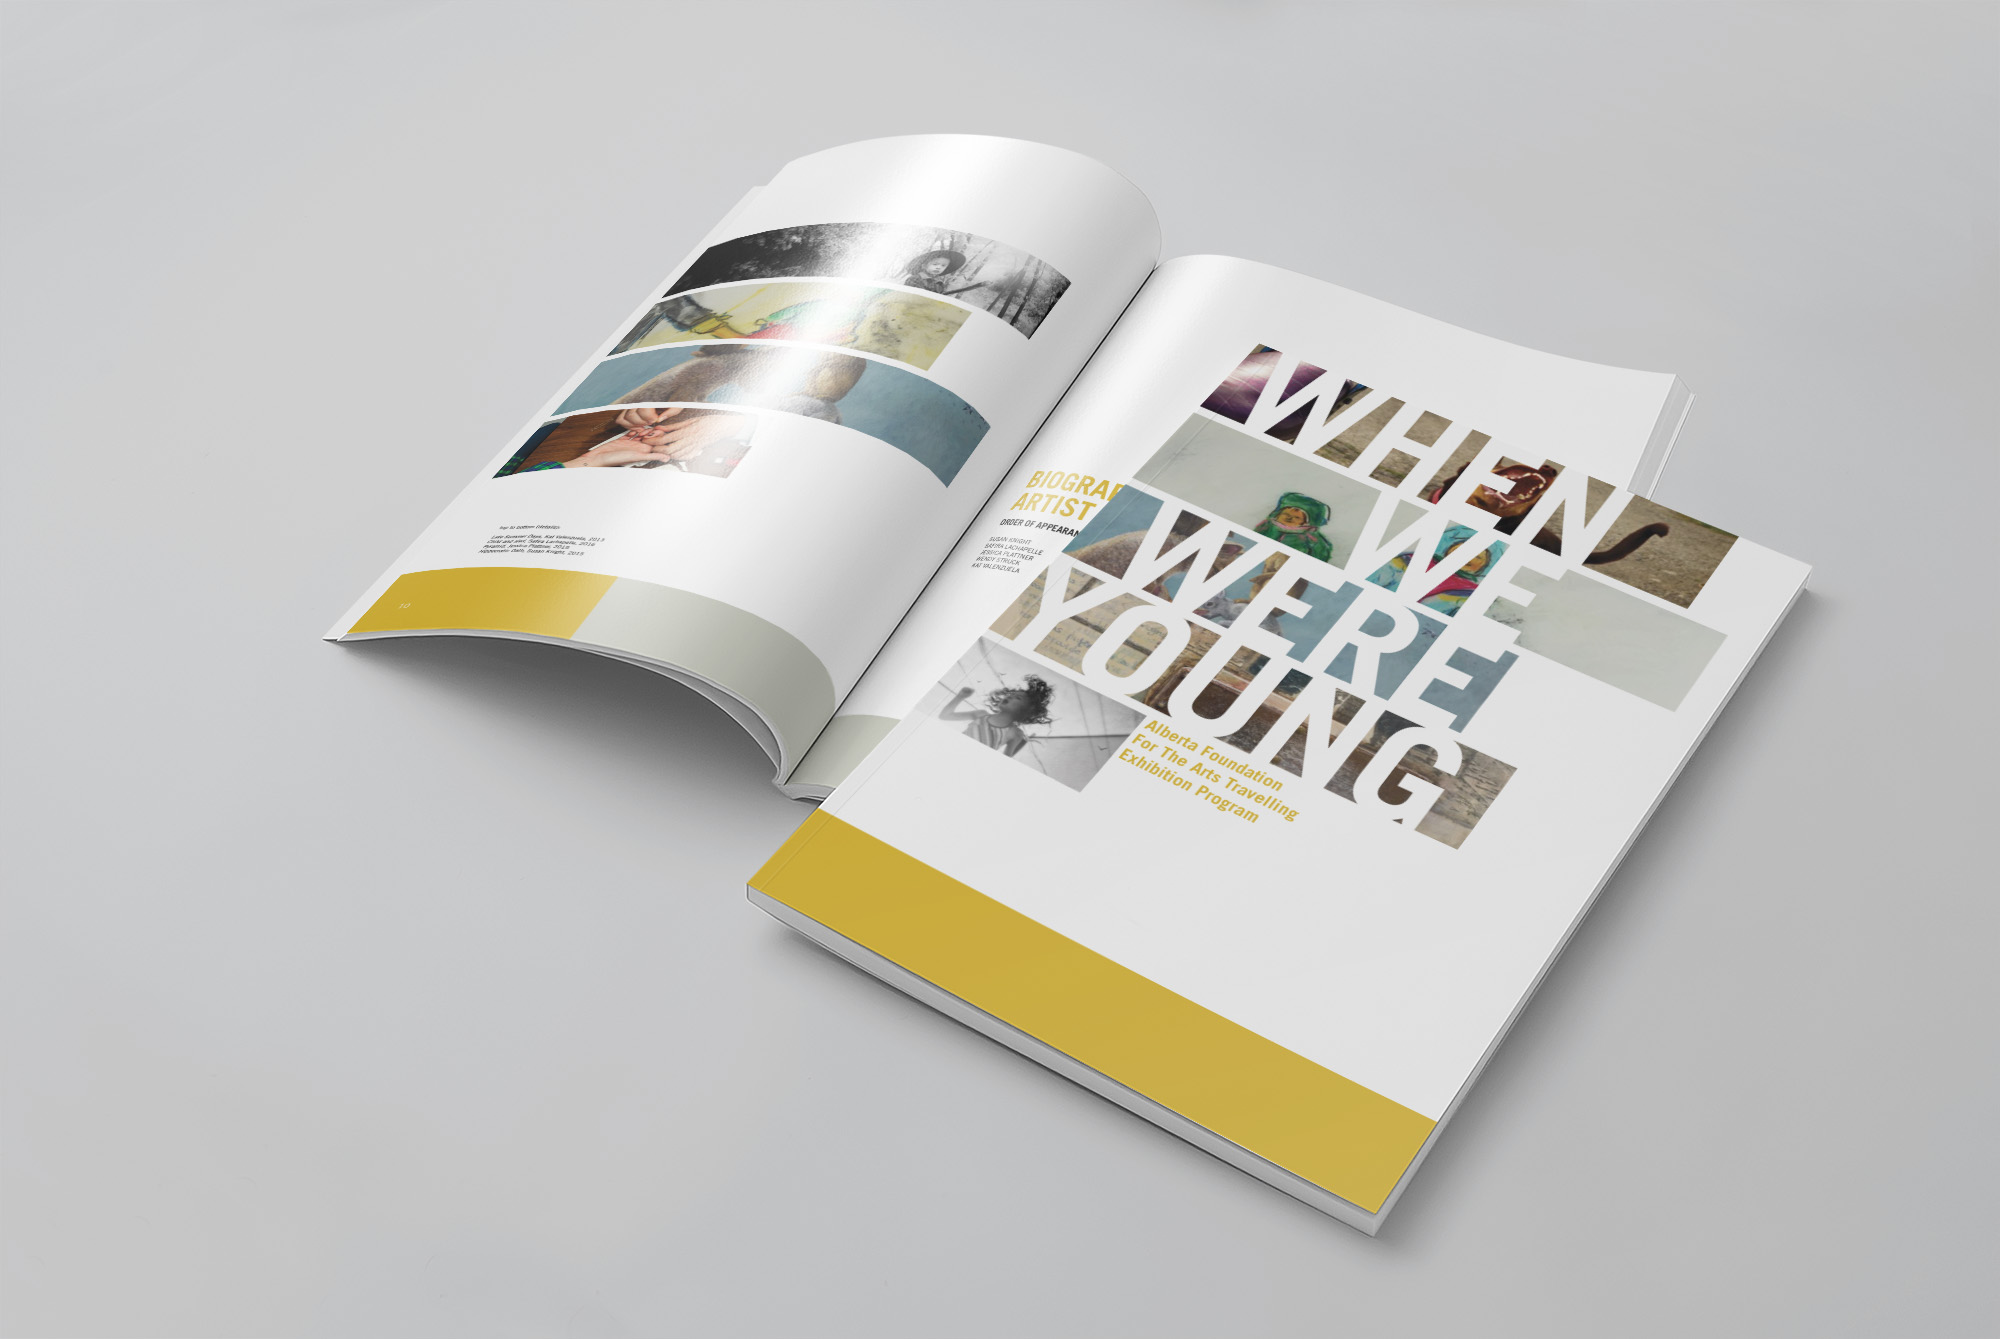 Flagfive_Trex_Catalogue2-1.jpg